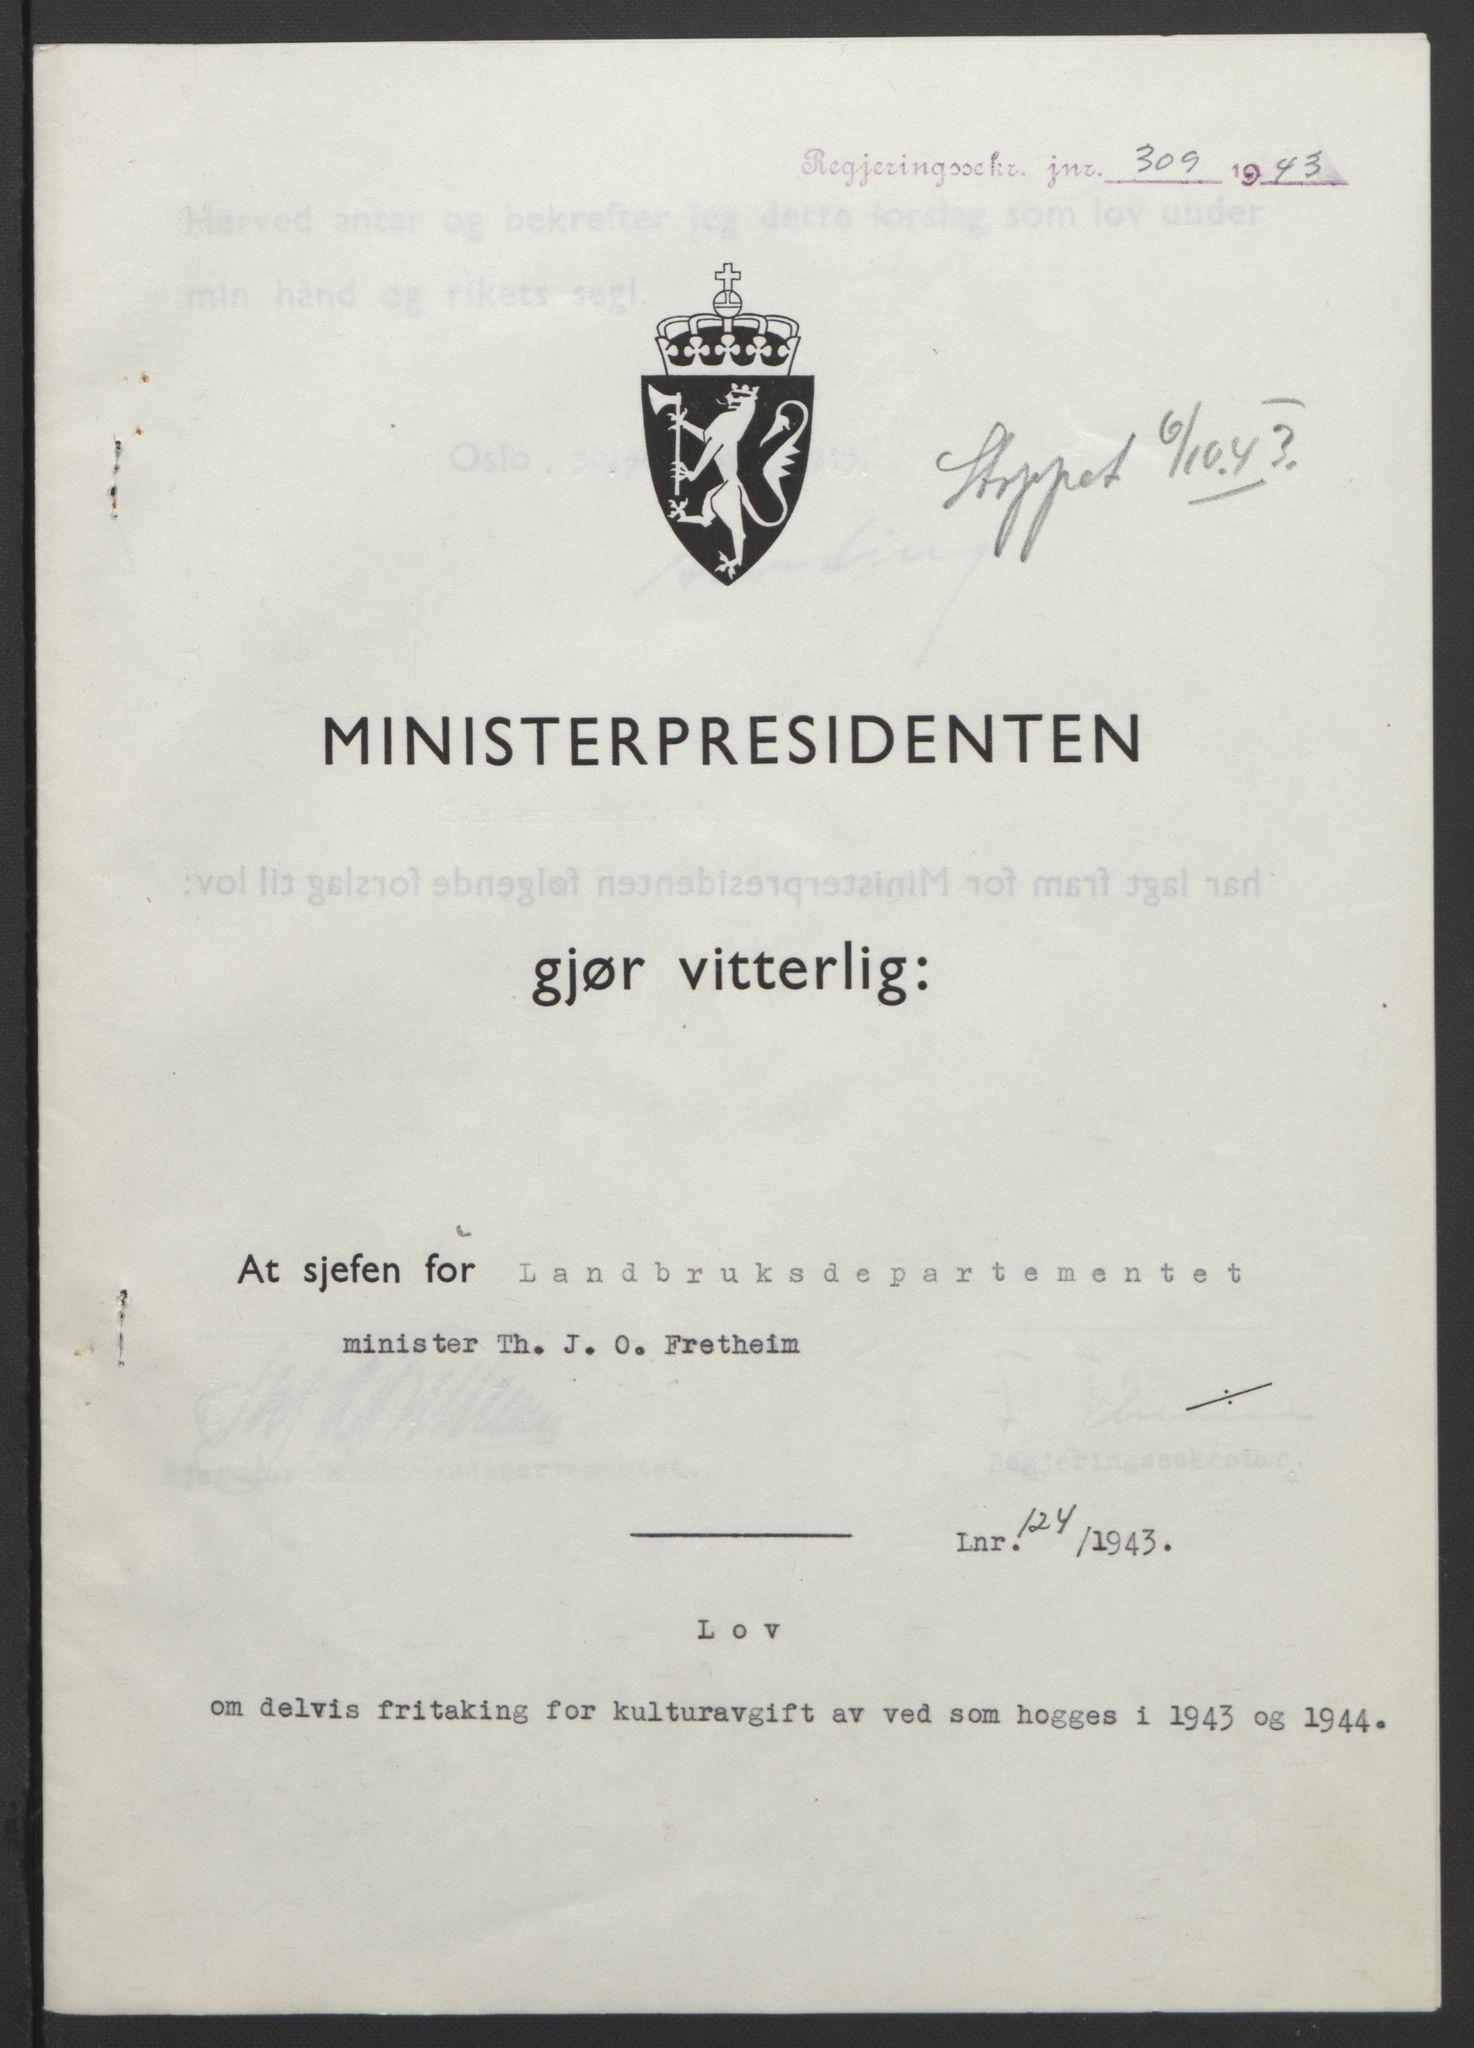 RA, NS-administrasjonen 1940-1945 (Statsrådsekretariatet, de kommisariske statsråder mm), D/Db/L0099: Lover, 1943, s. 576